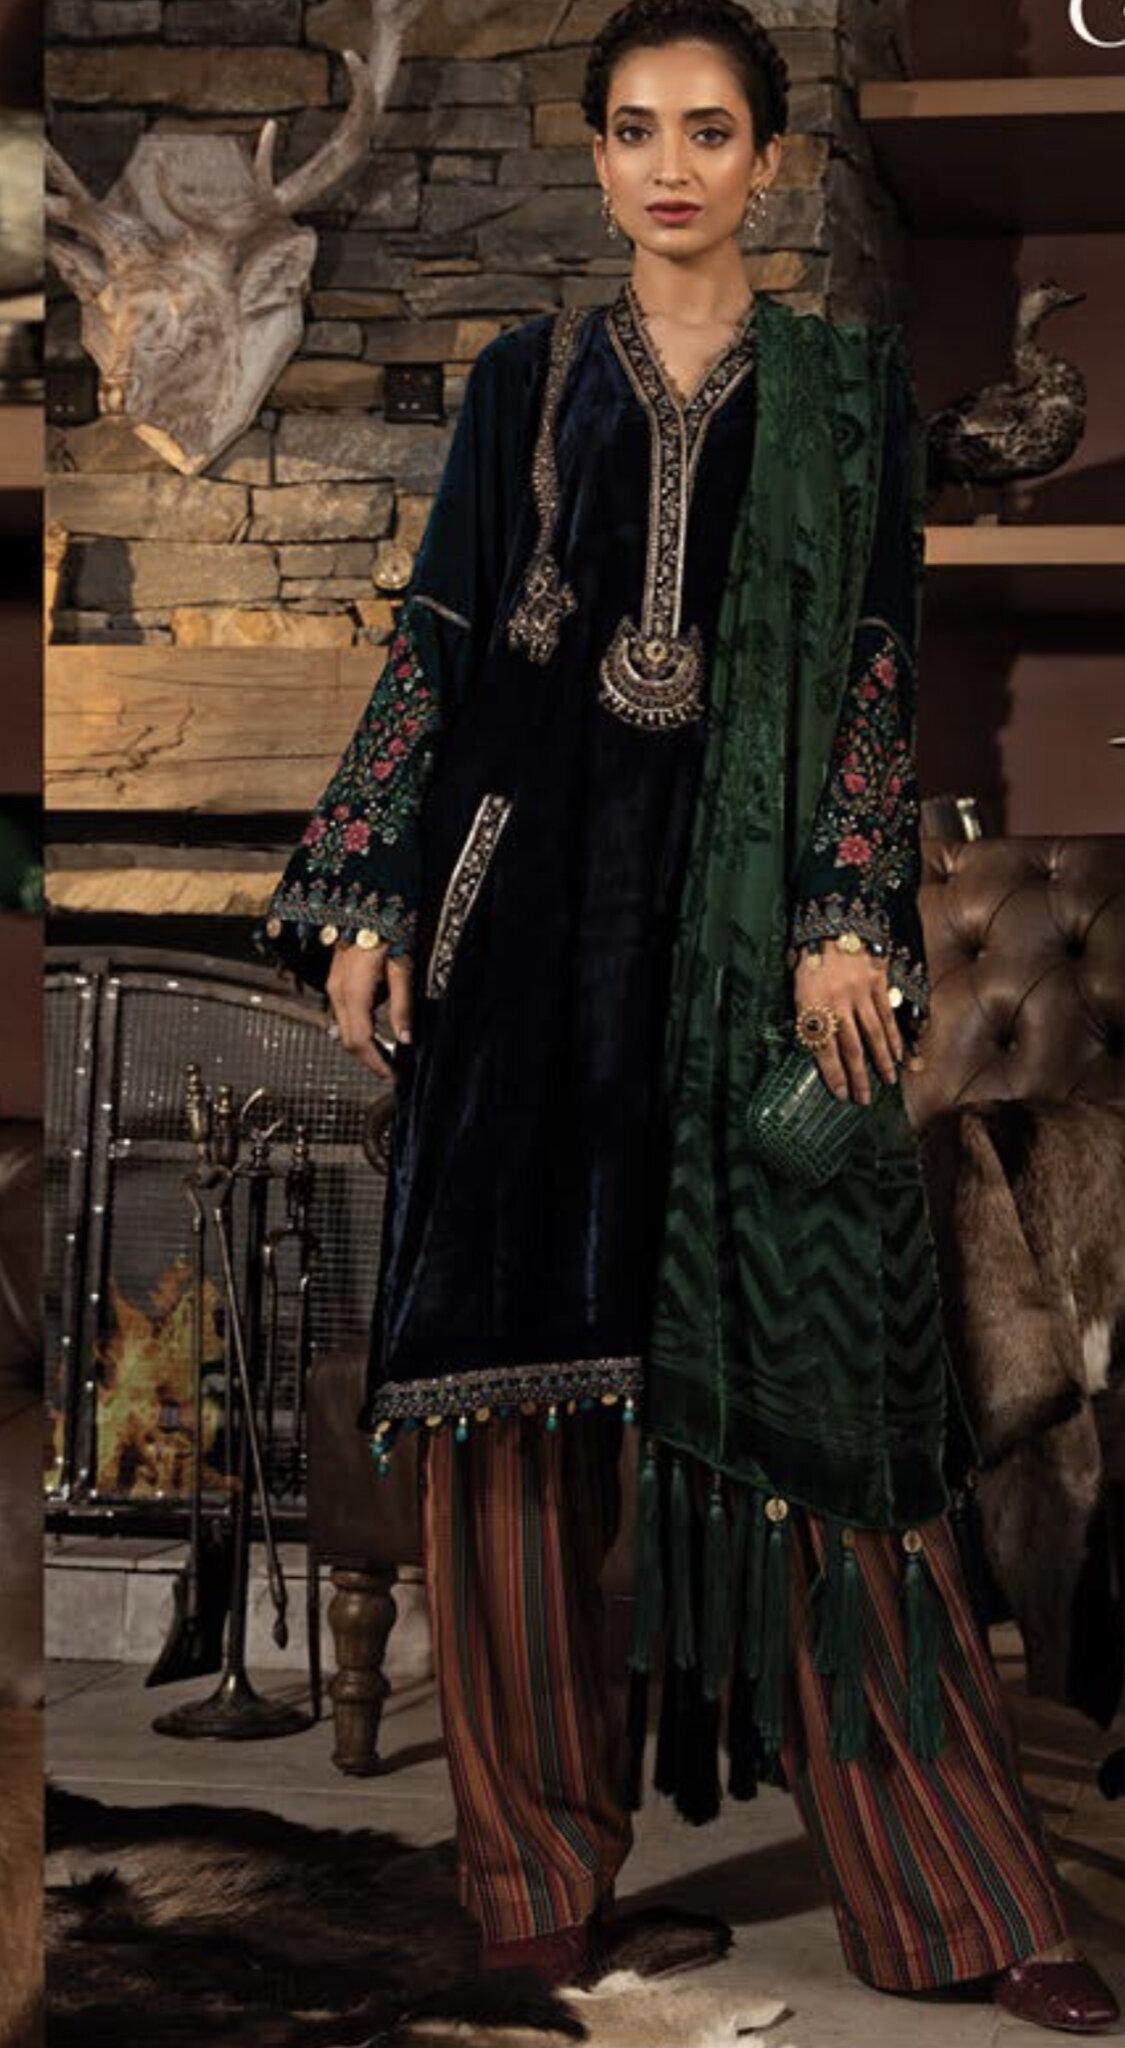 Pakistani Sanasafinaz inspired linen Stitched Salwar kameez suit